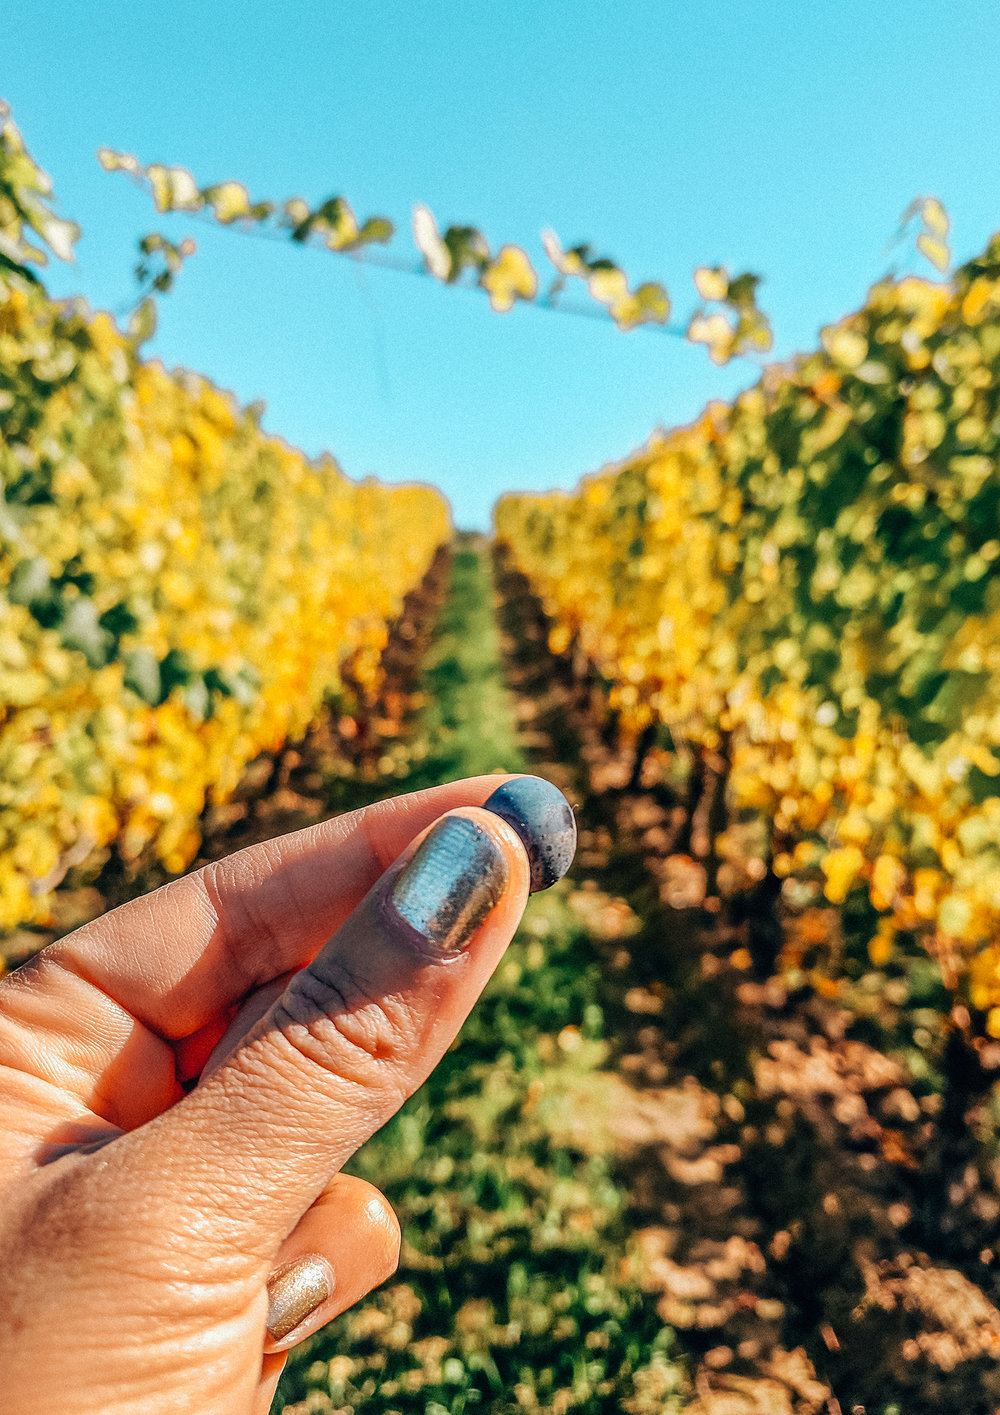 Adelsheim vineyard grape